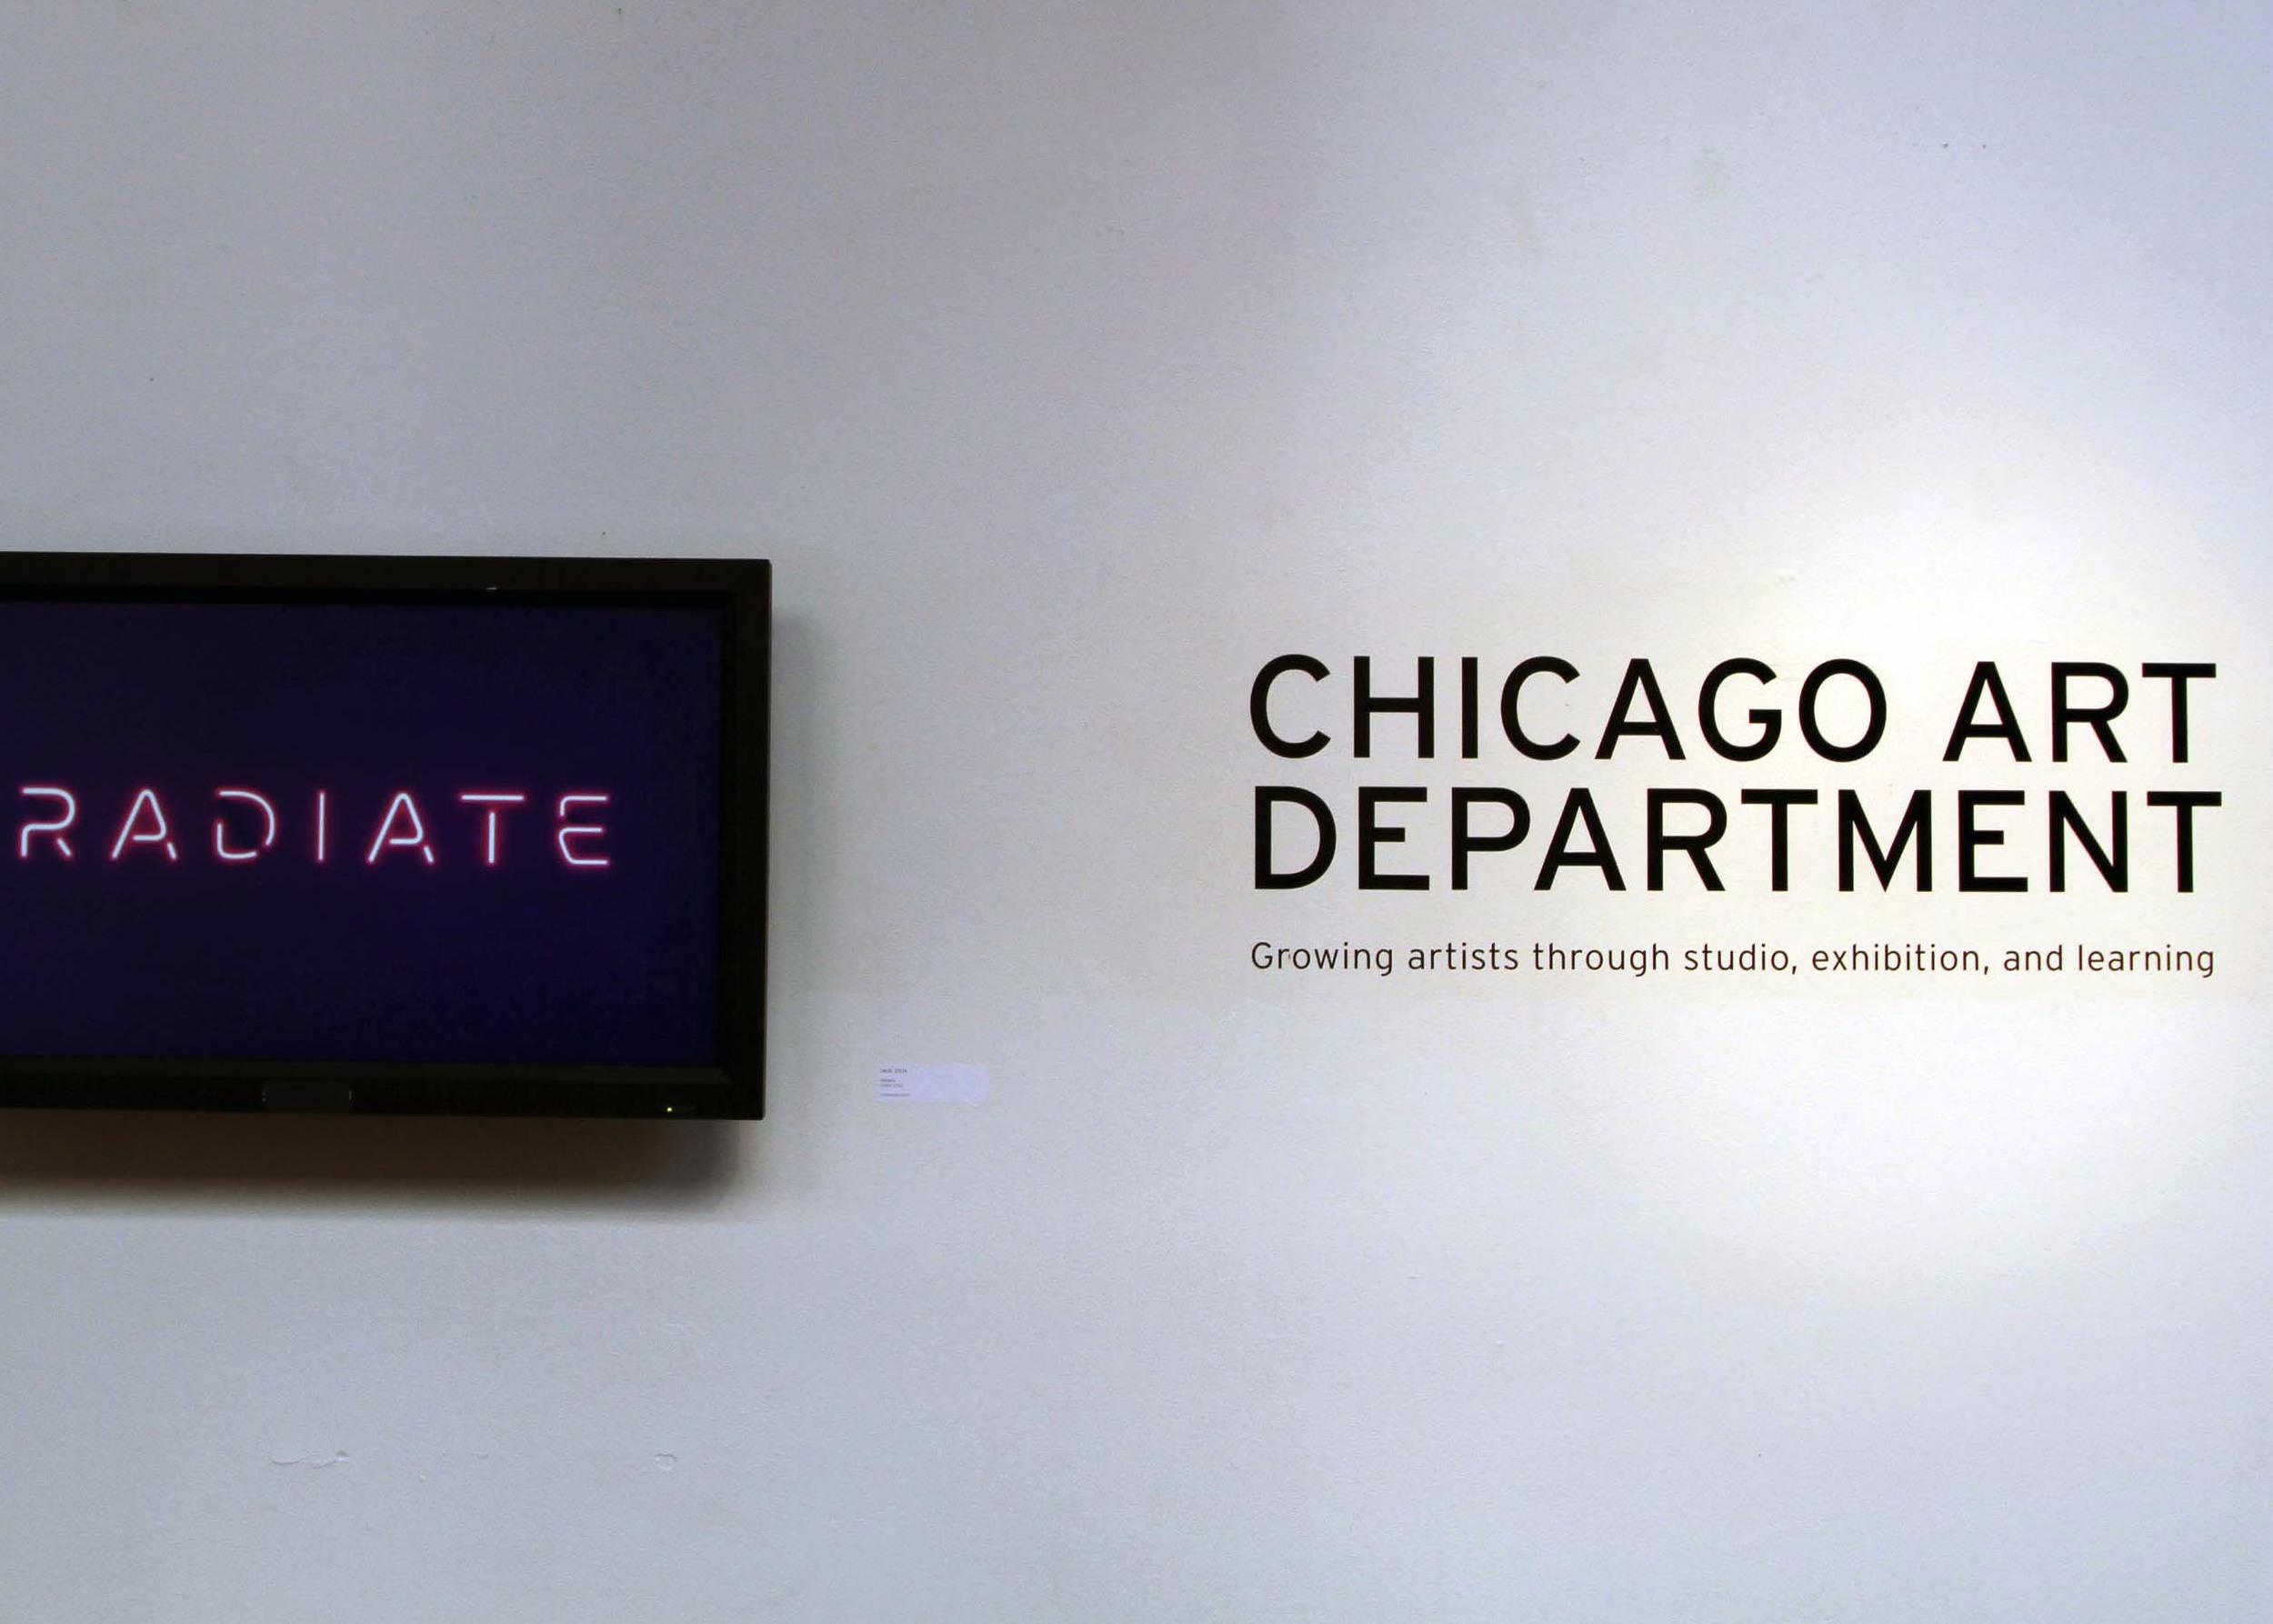 chicago art department 5.jpg